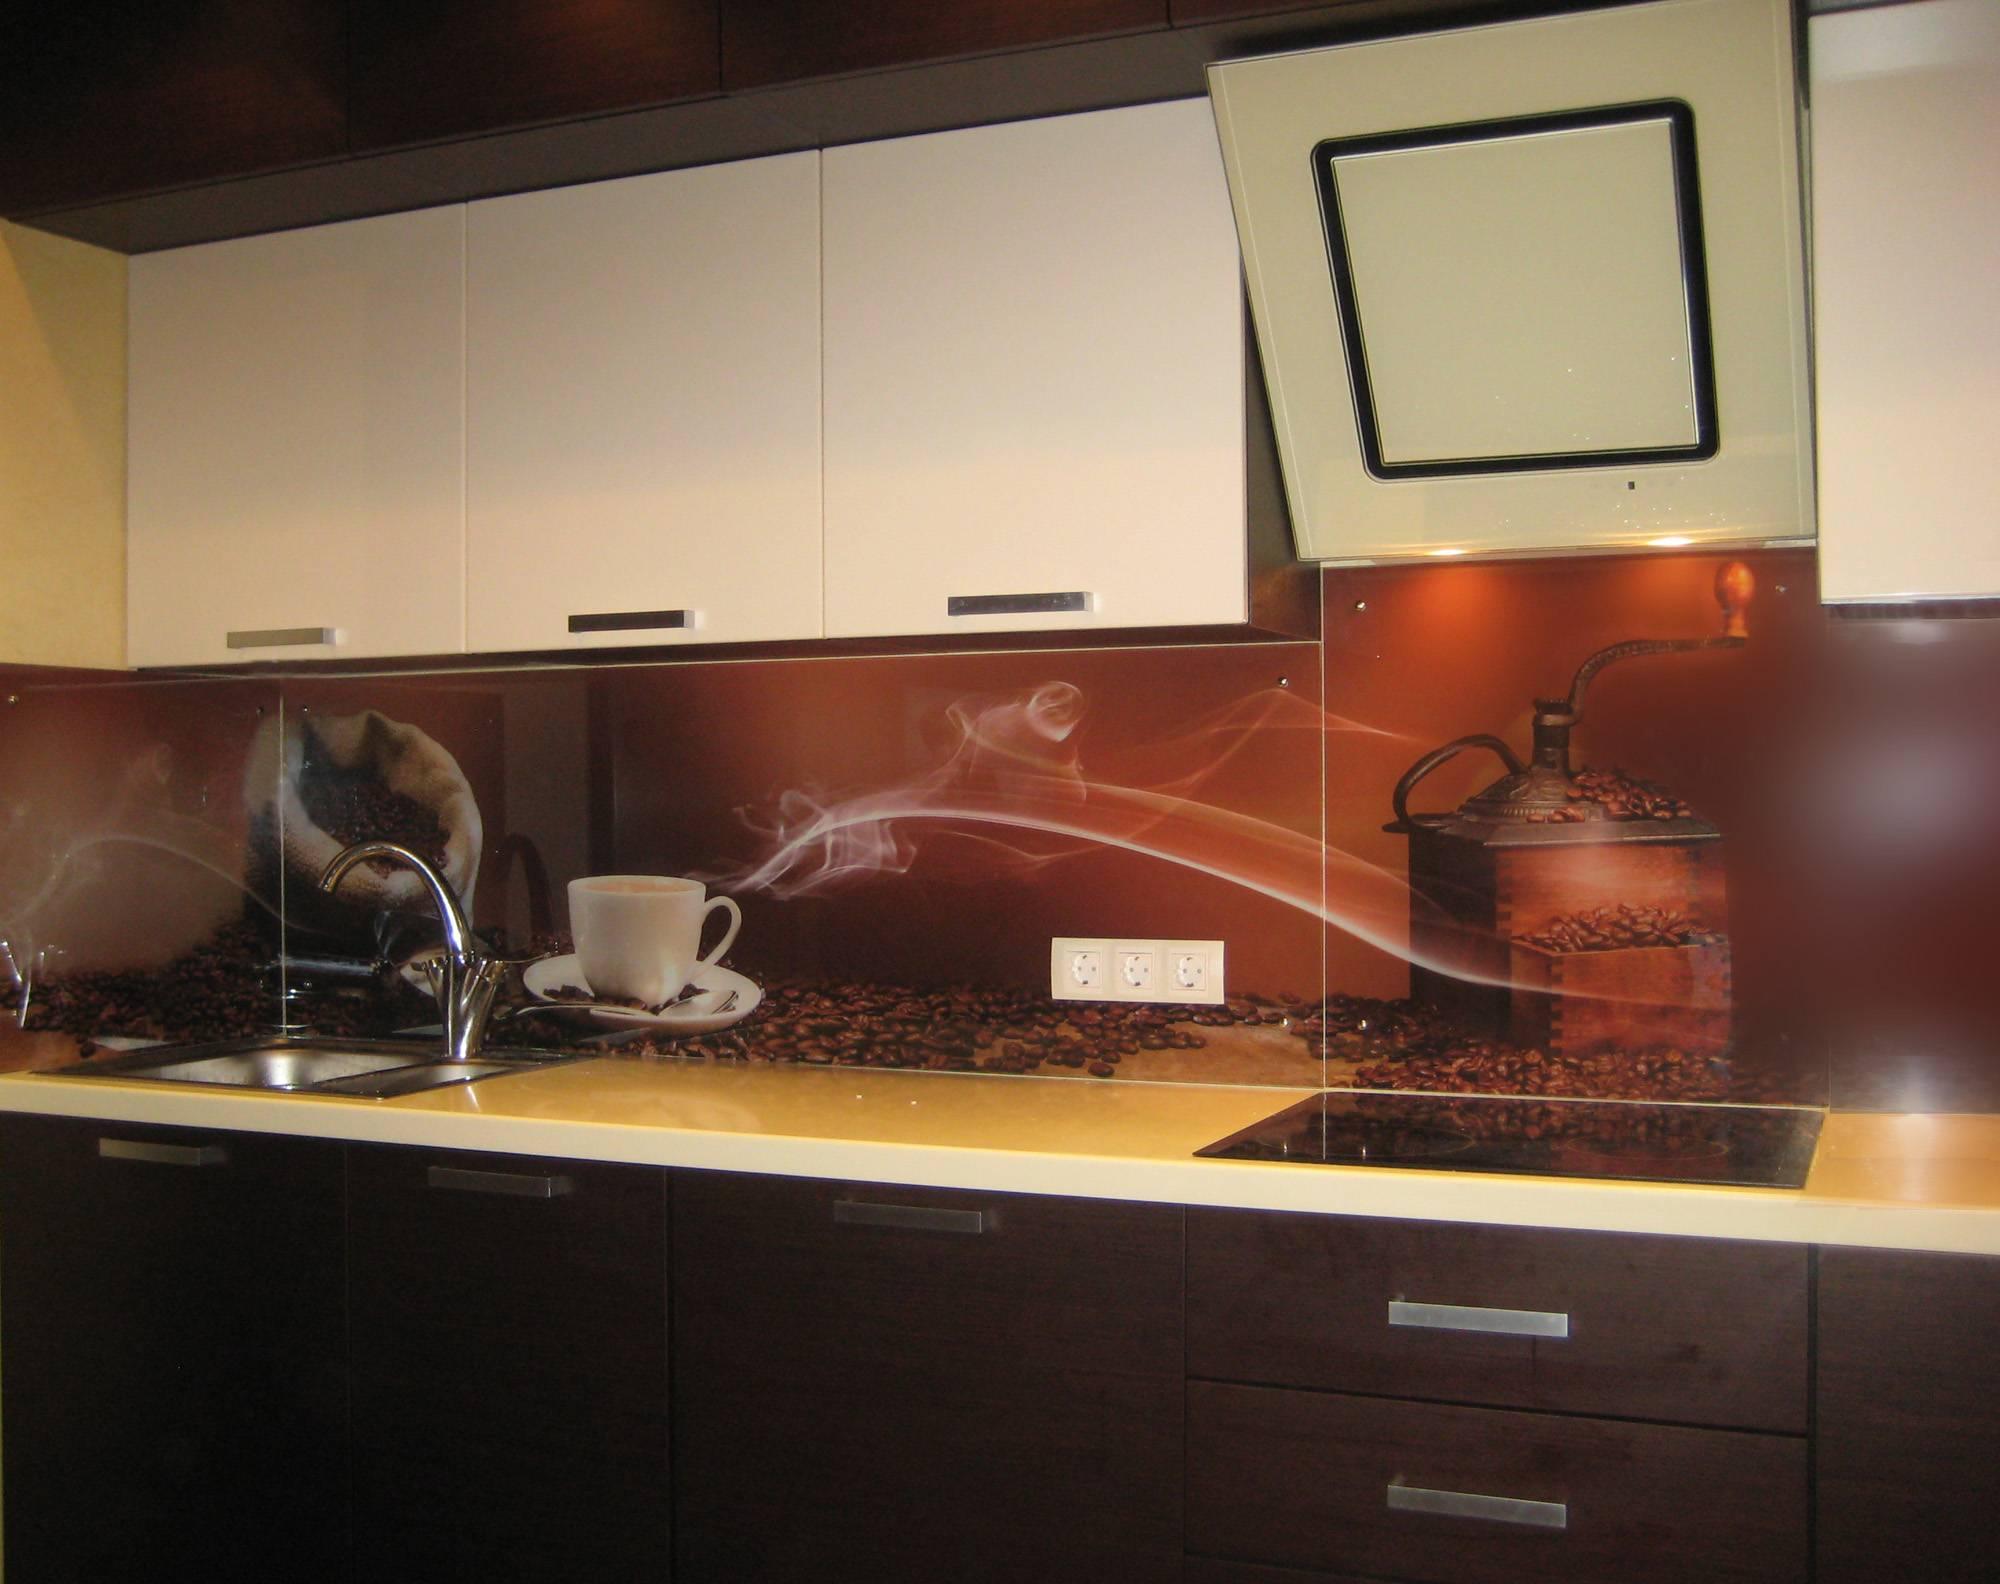 Установка скинали: правила и нюансы монтажа на кухне